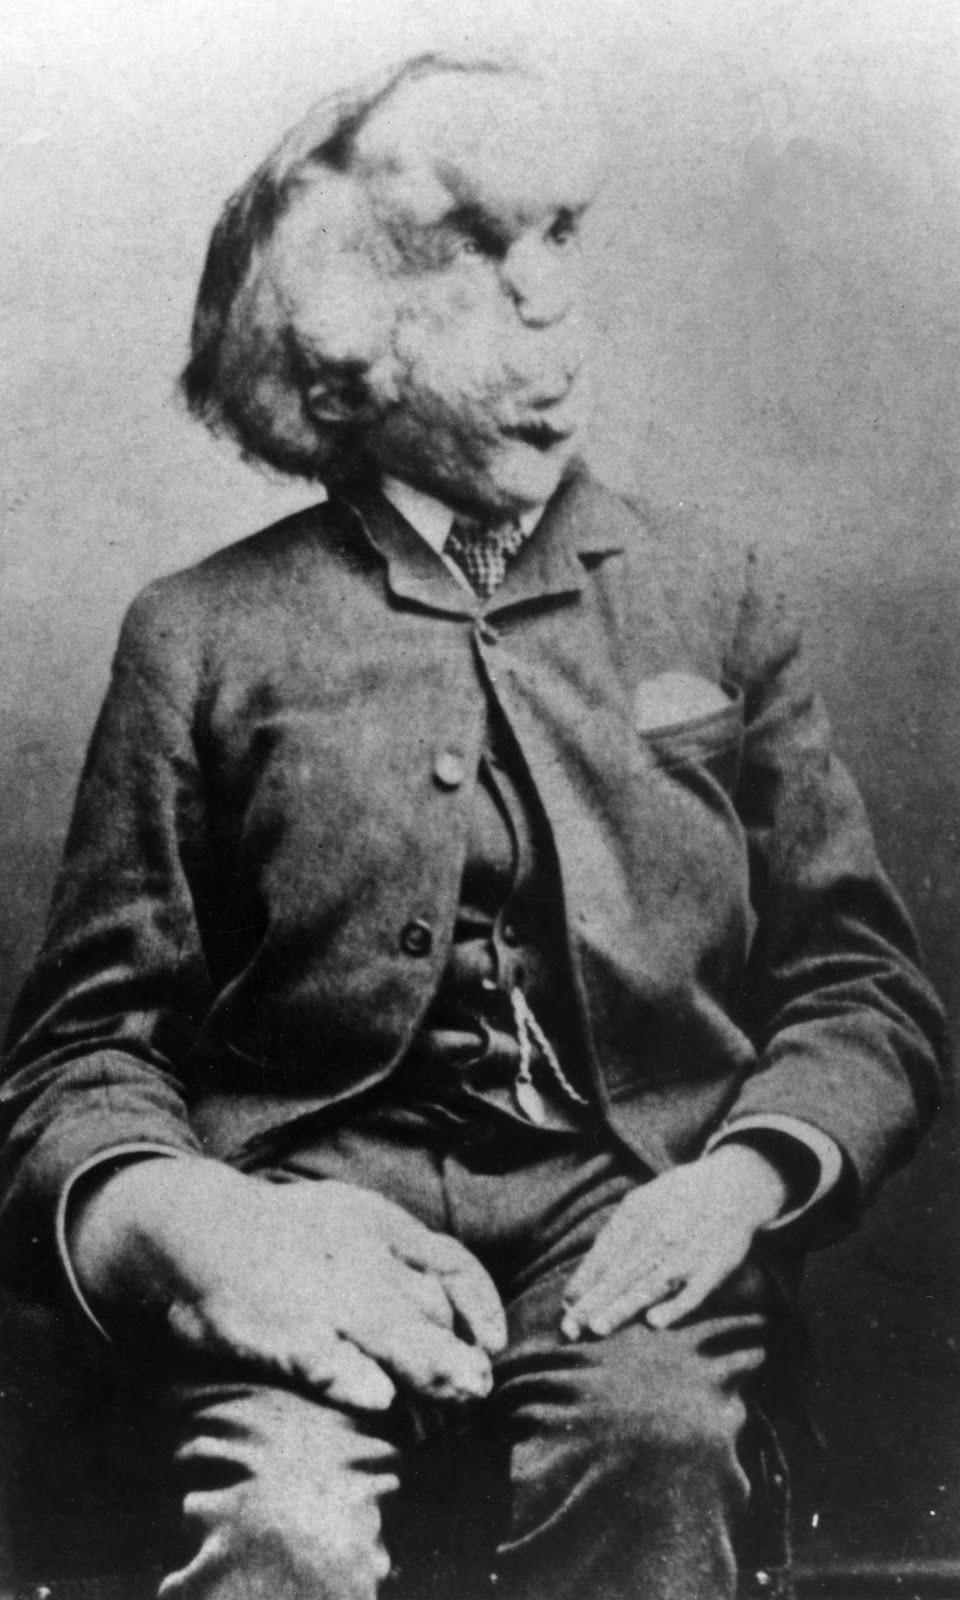 Joseph Merrick carte de visite photo, c. 1889